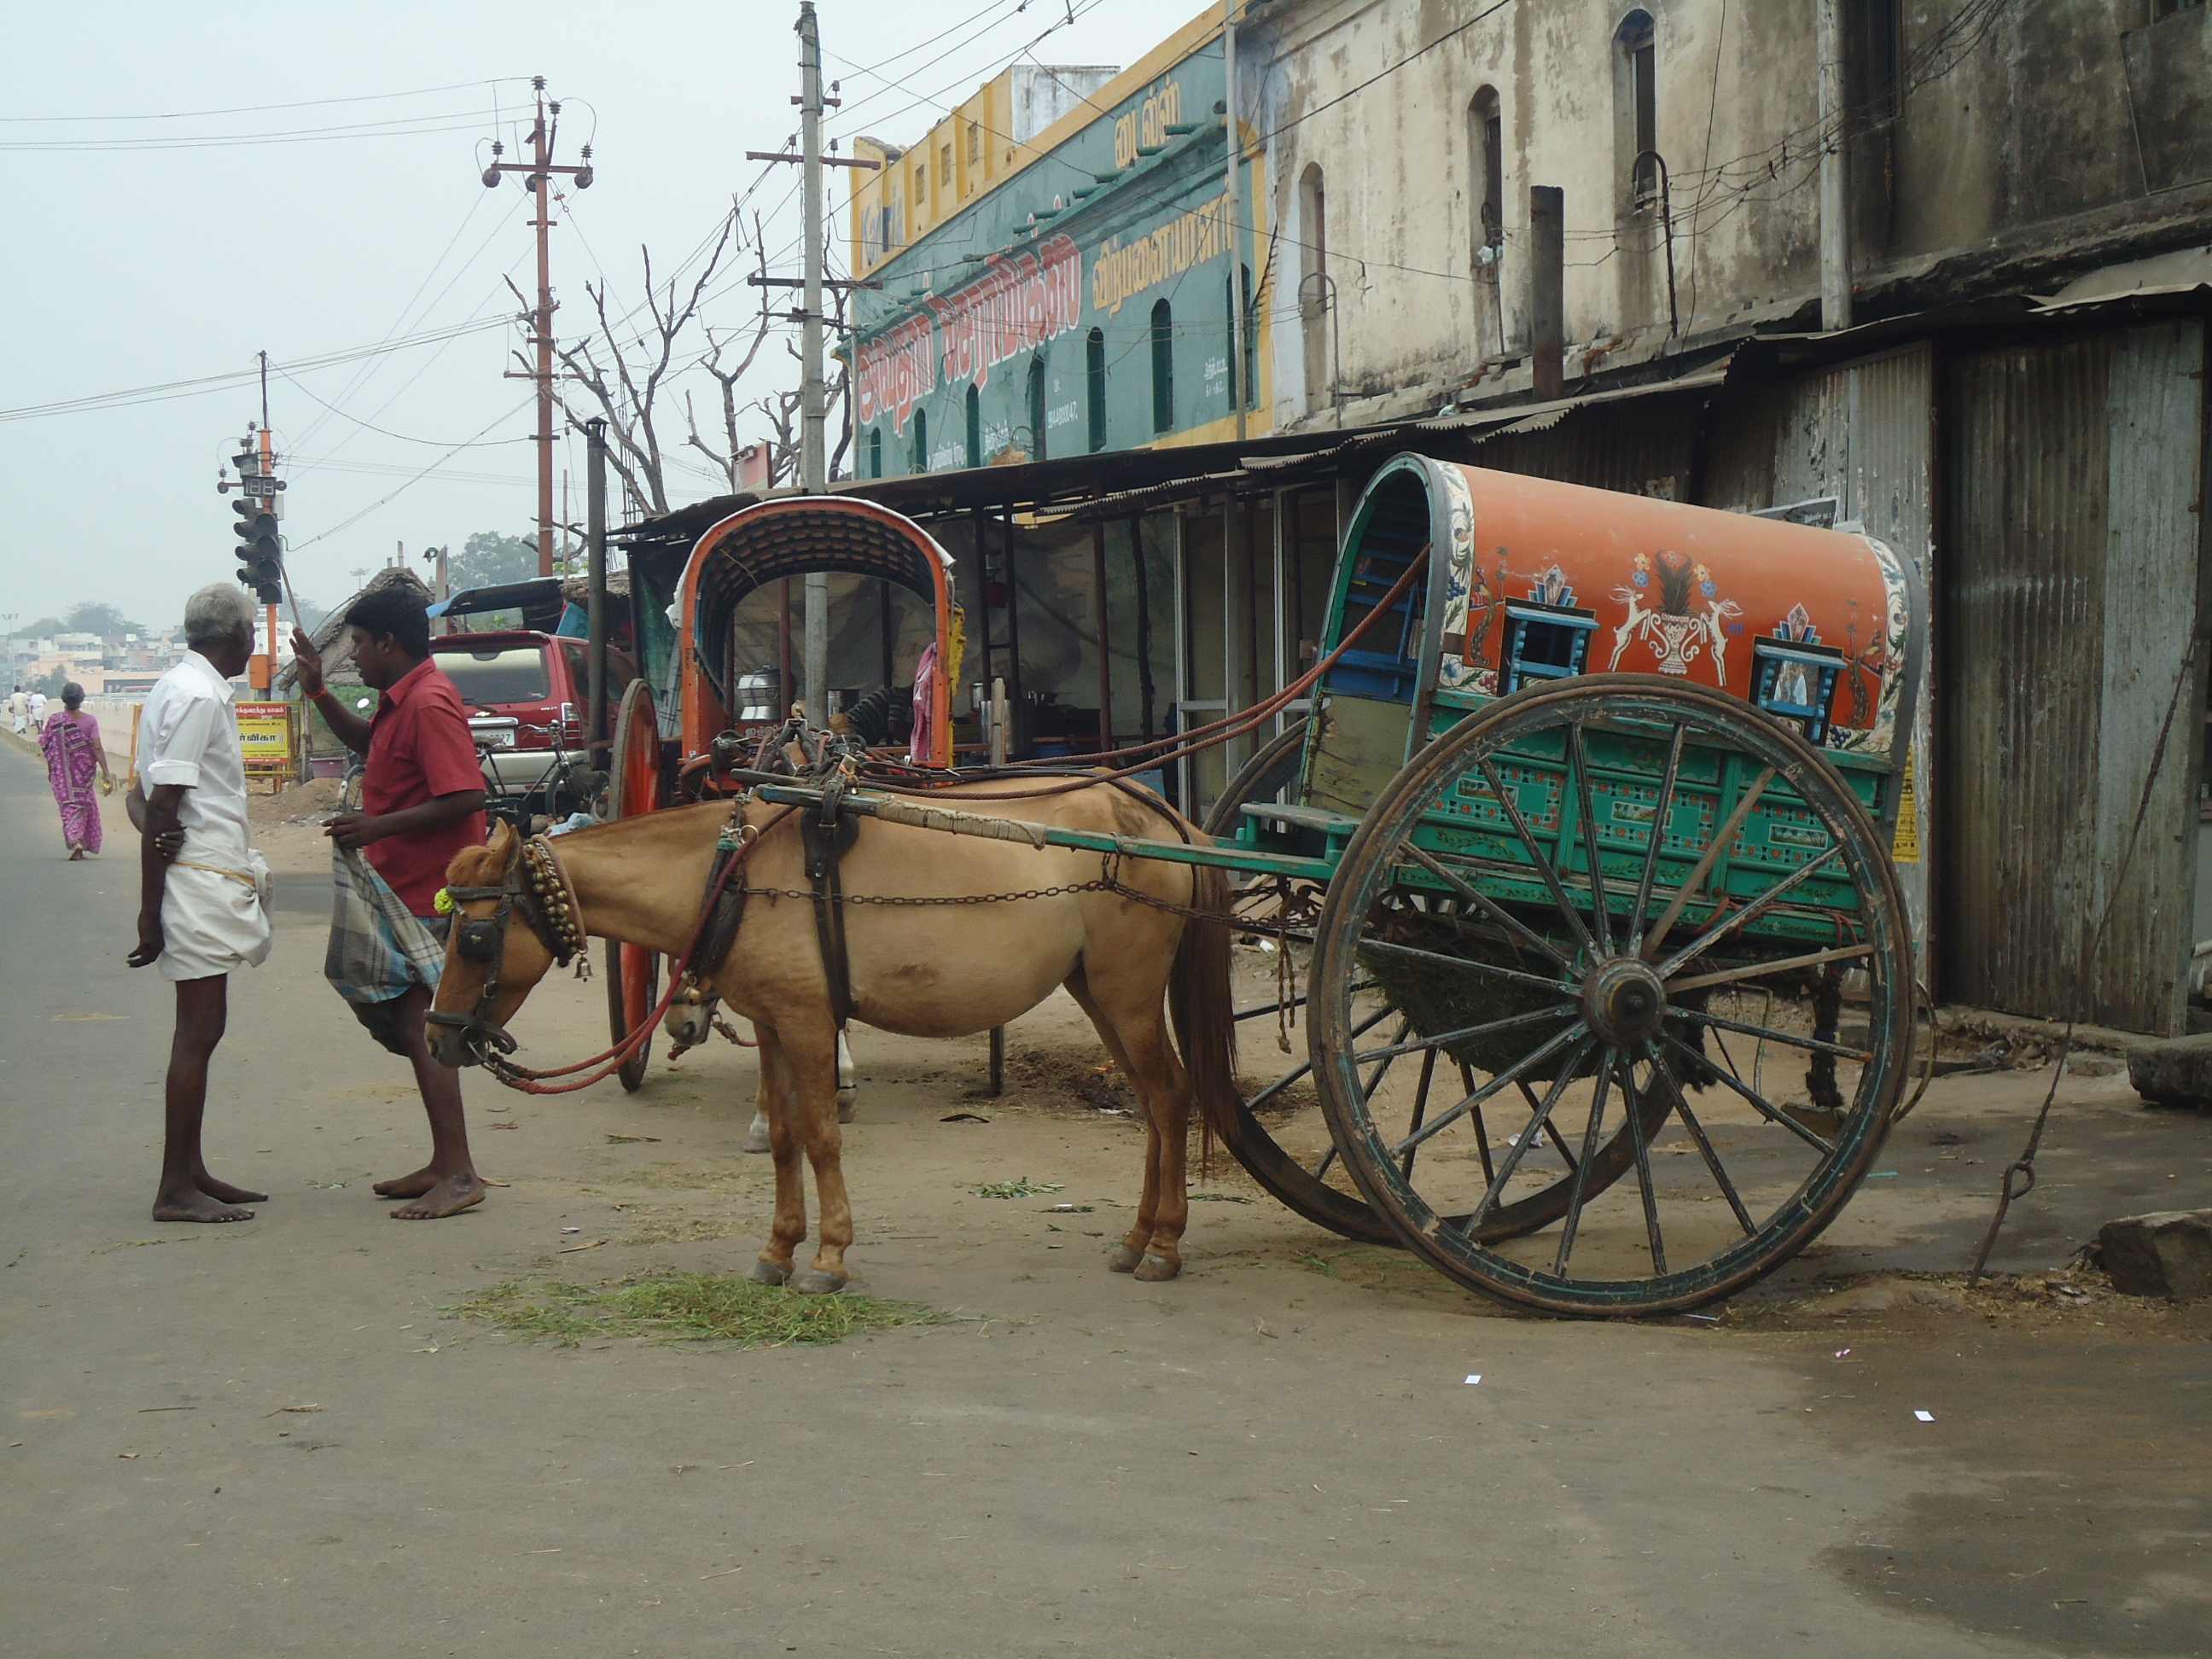 Travel Carts For Car Seats